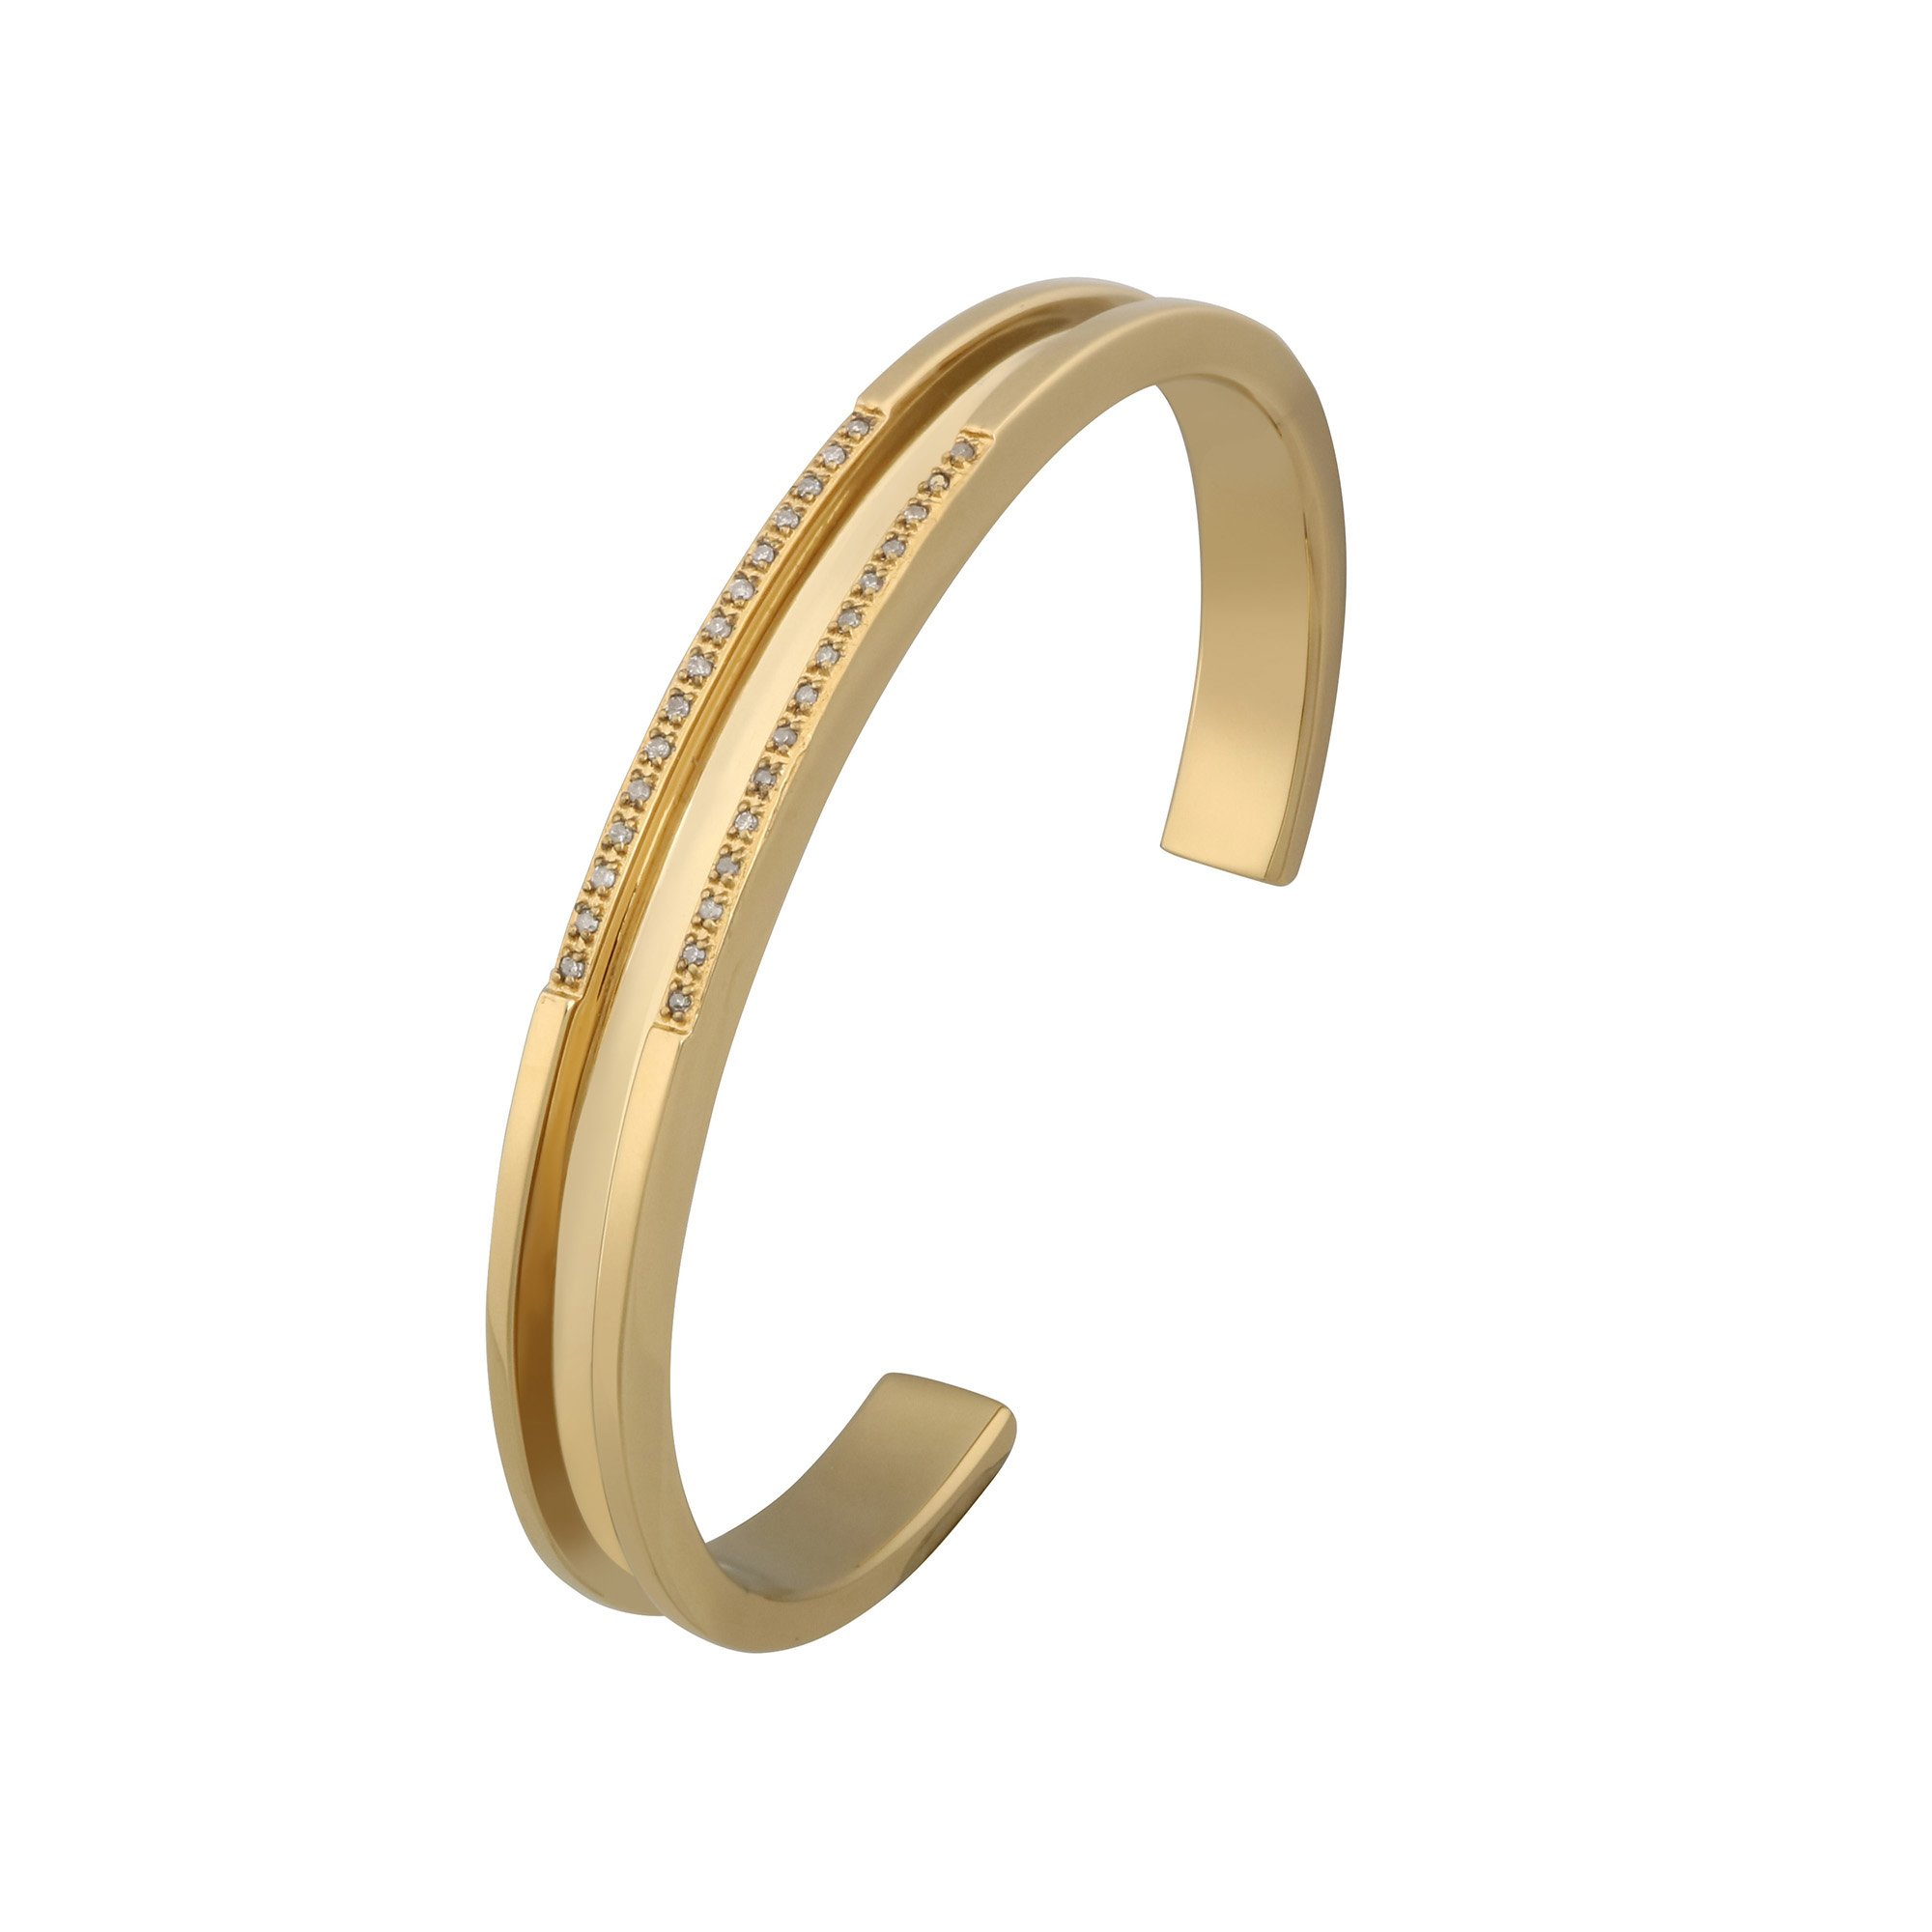 Hair Tie Diamond Bangle, Gold, stainless steel, Dia TW15